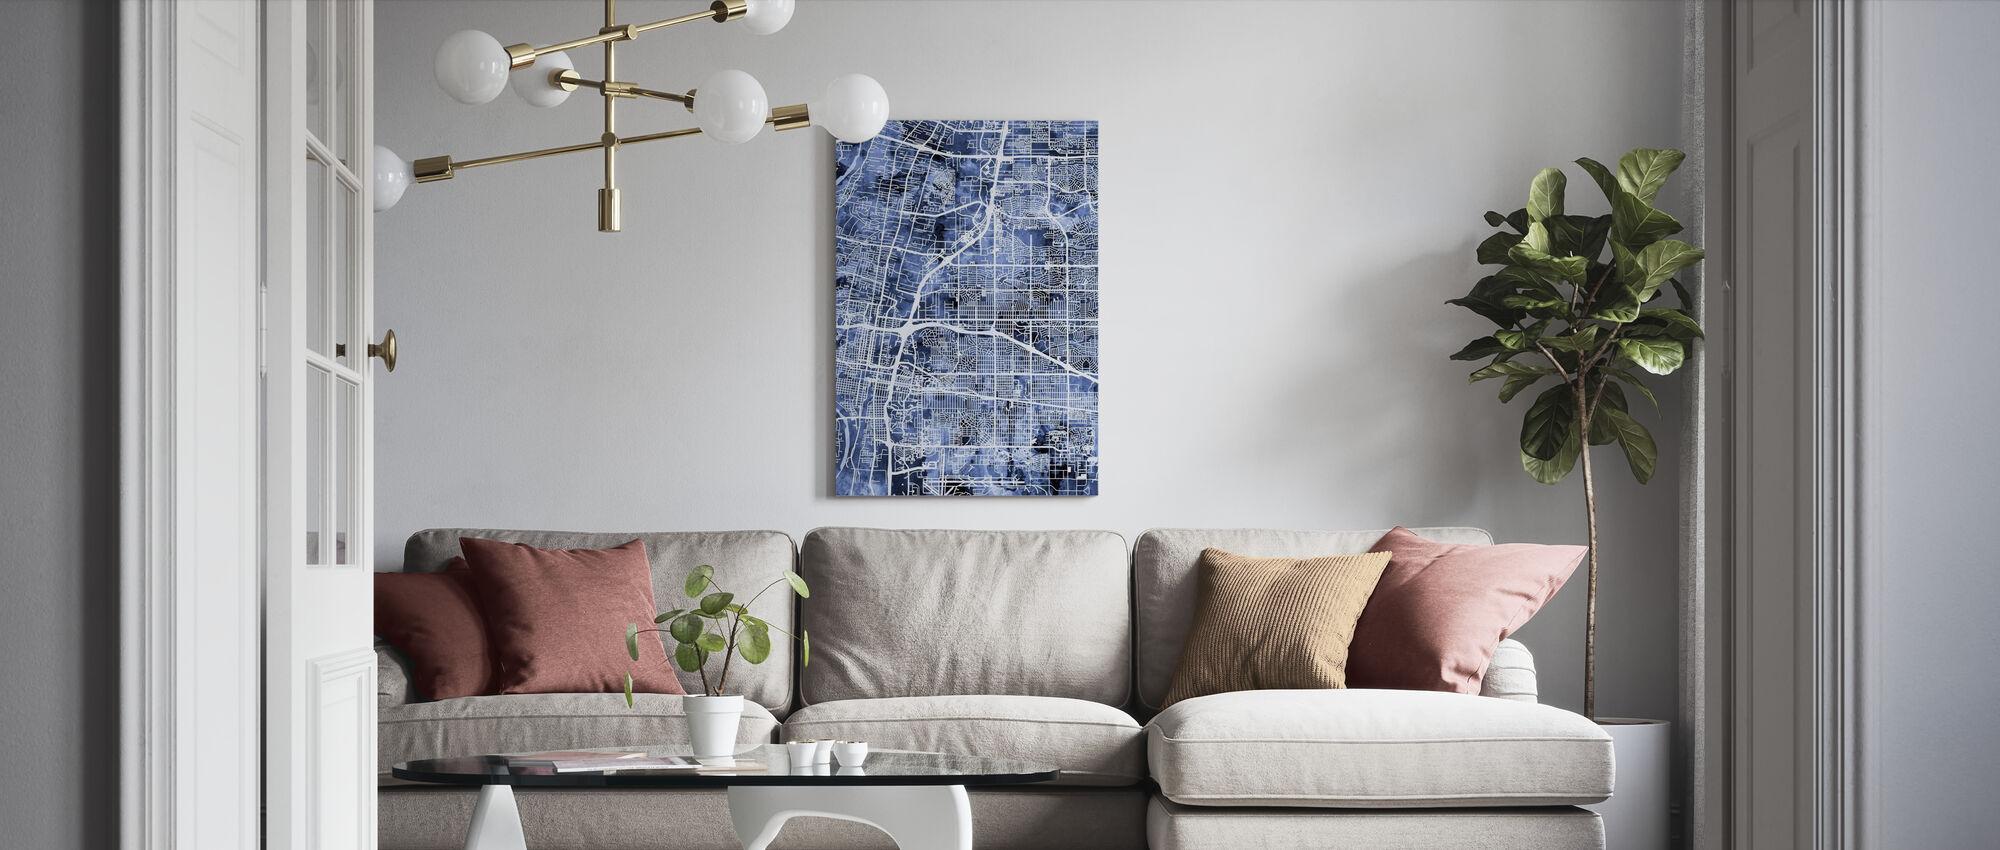 Albuquerque New Mexico City Street Map - Canvas print - Living Room